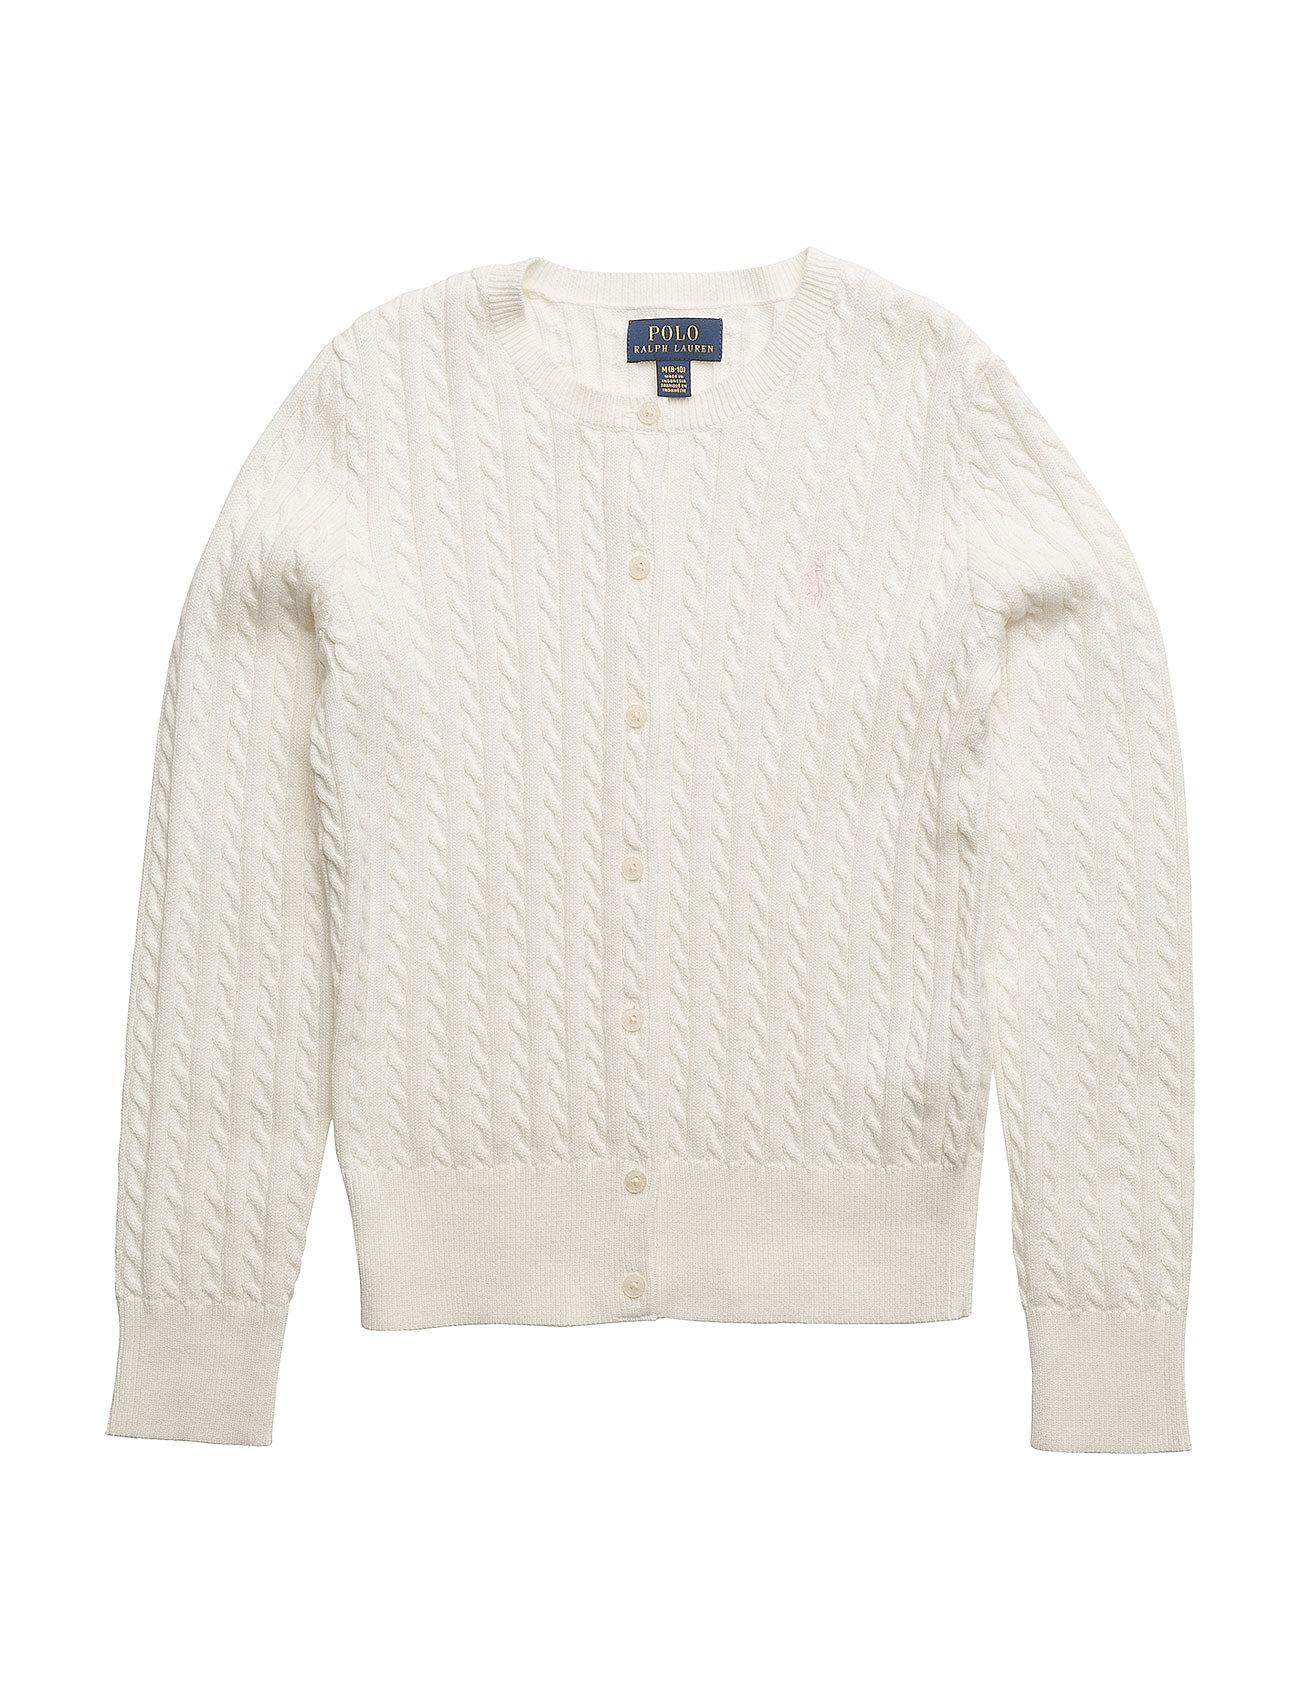 Ralph Lauren Kids MINI CABLE-TOPS-SWEATER - WARM WHITE